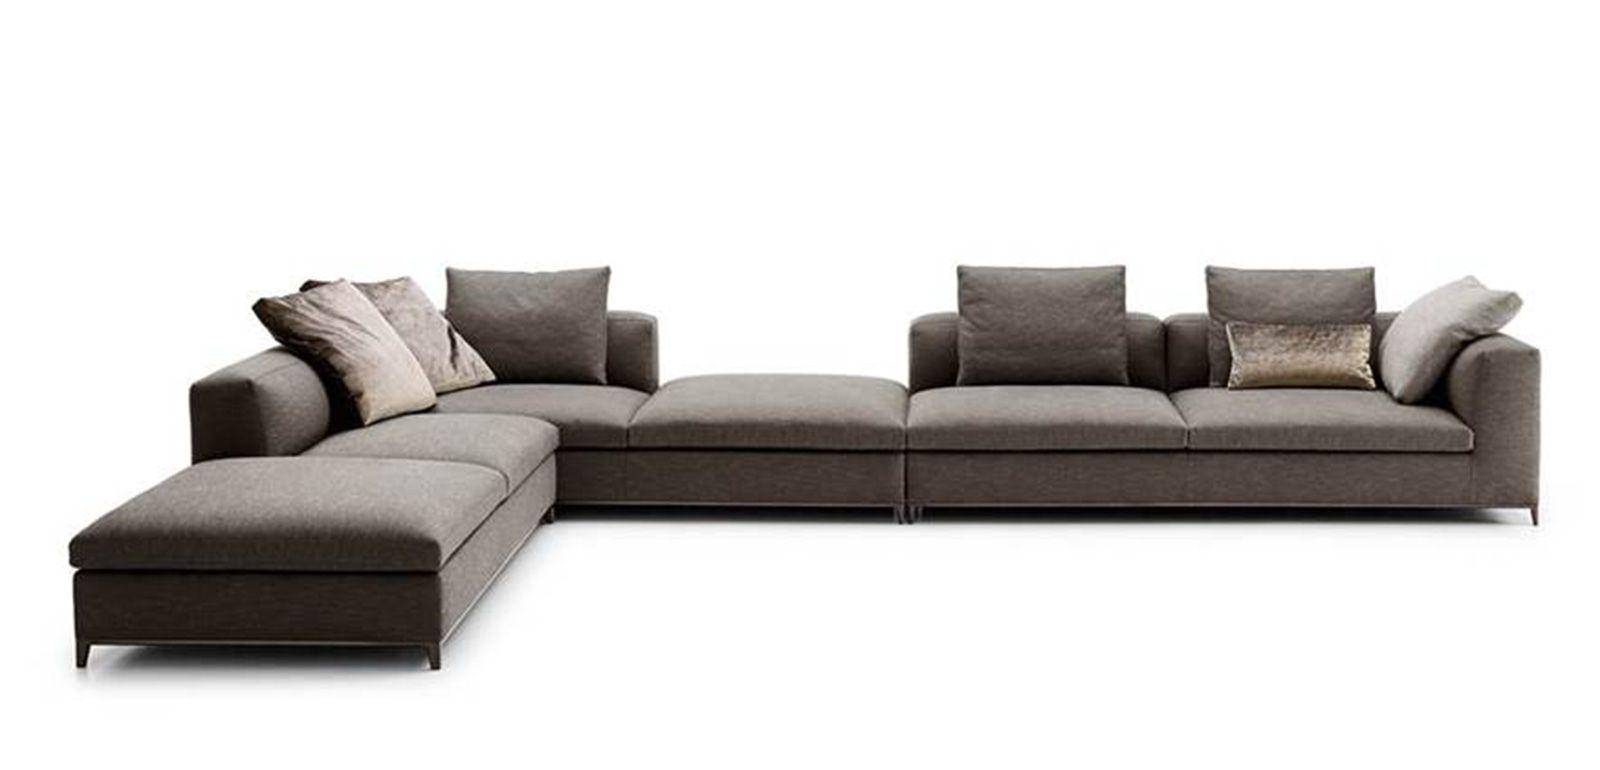 nouveautes b b italia cappellini et maxalto silvera. Black Bedroom Furniture Sets. Home Design Ideas